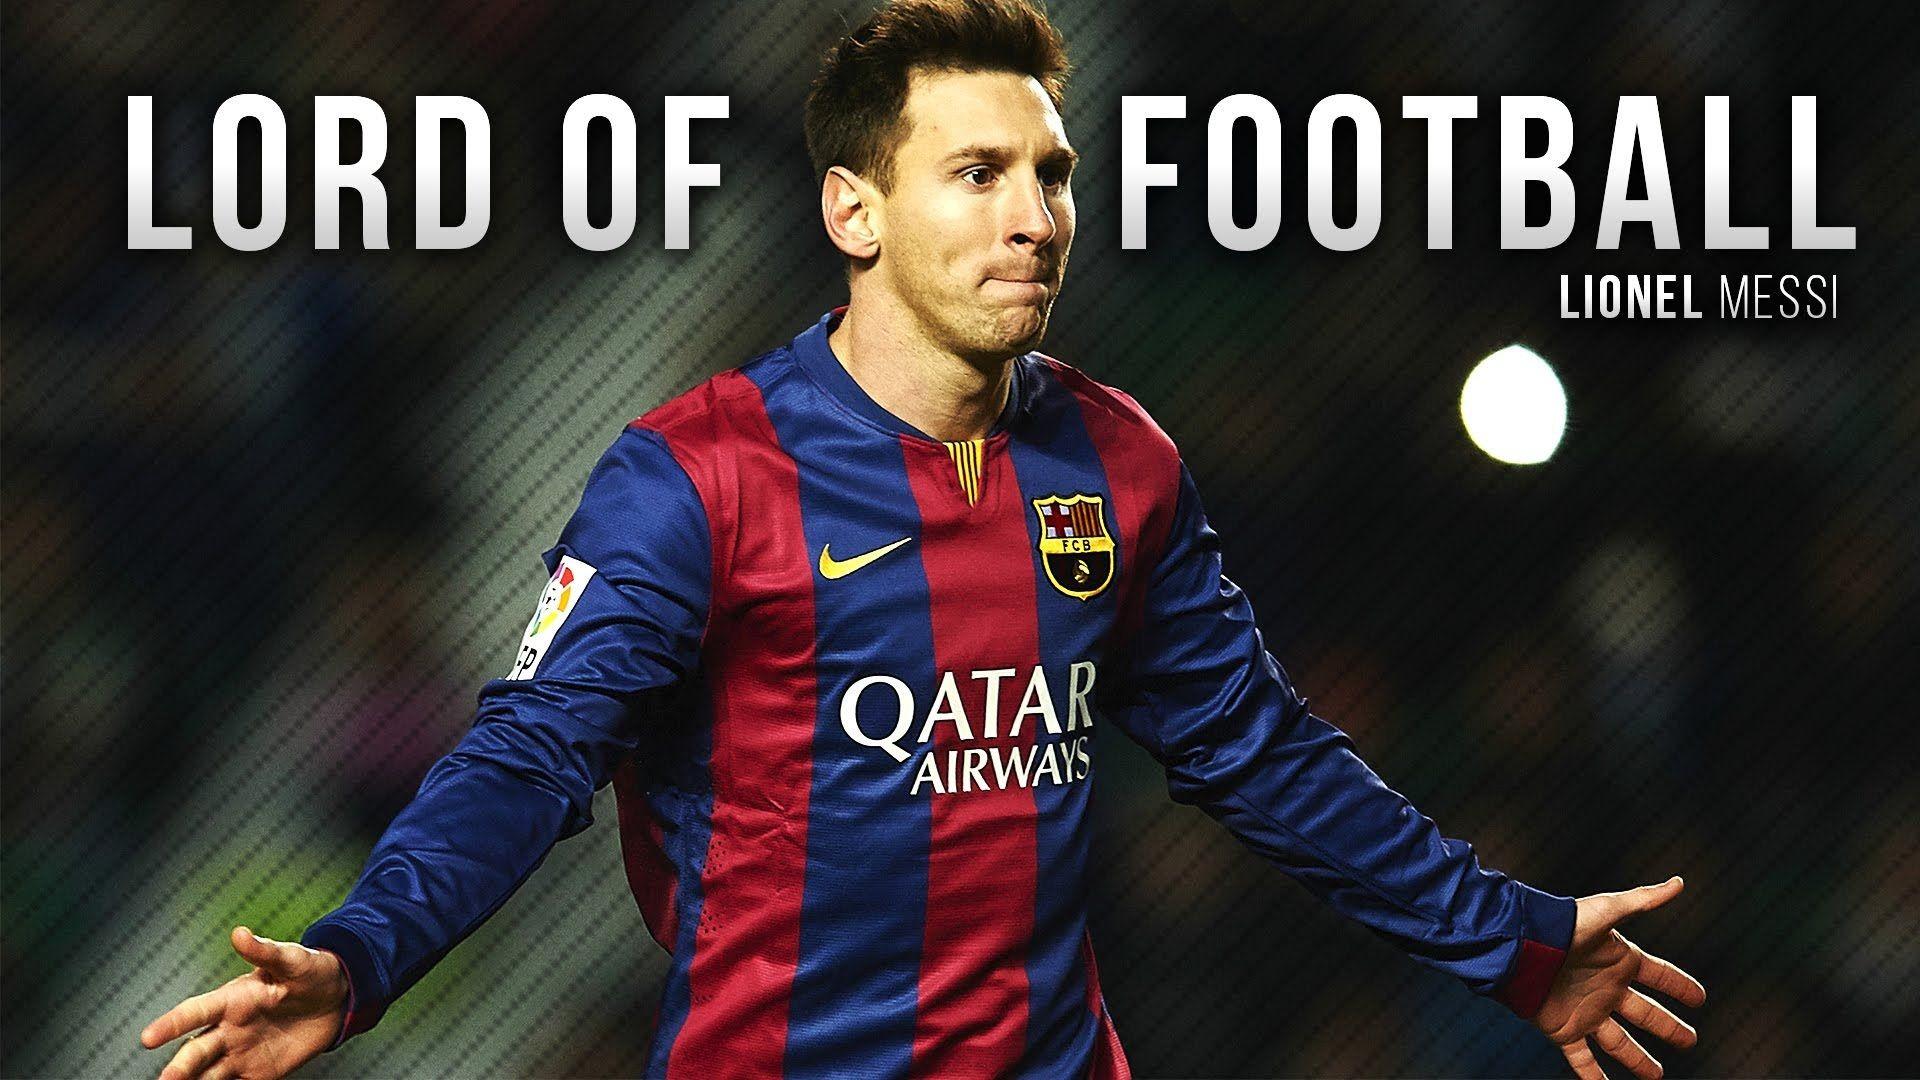 Lionel Messi Wallpapers HD https://www.wallpapersvenue.com/lionel-